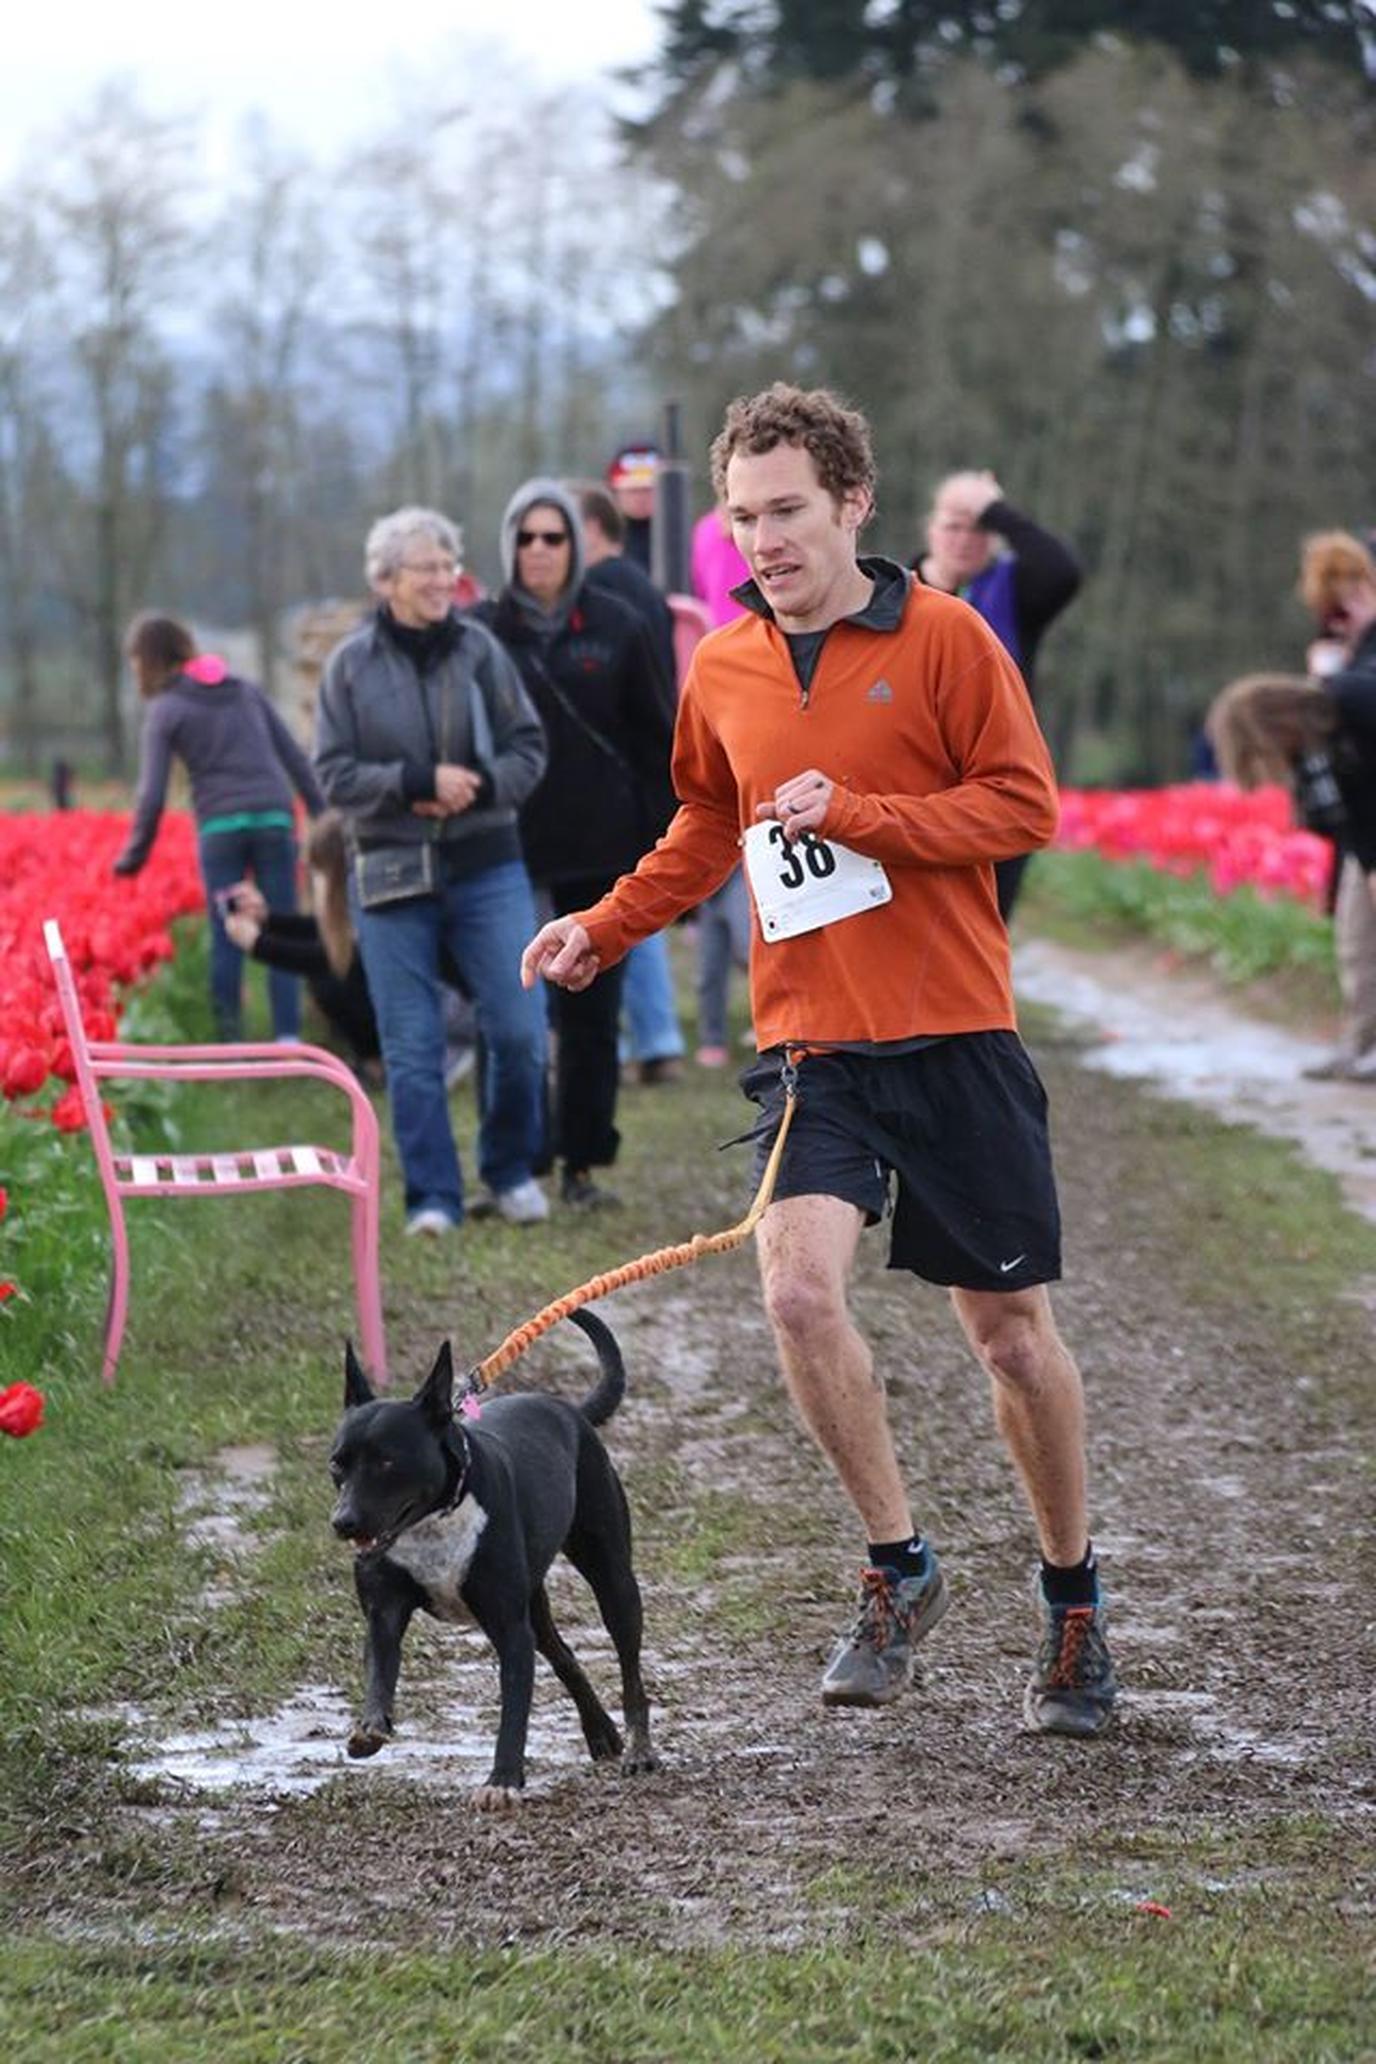 A Man Runs Through the Mud With His Dog at a Pet-Friendly Spring Run in Woodburn.